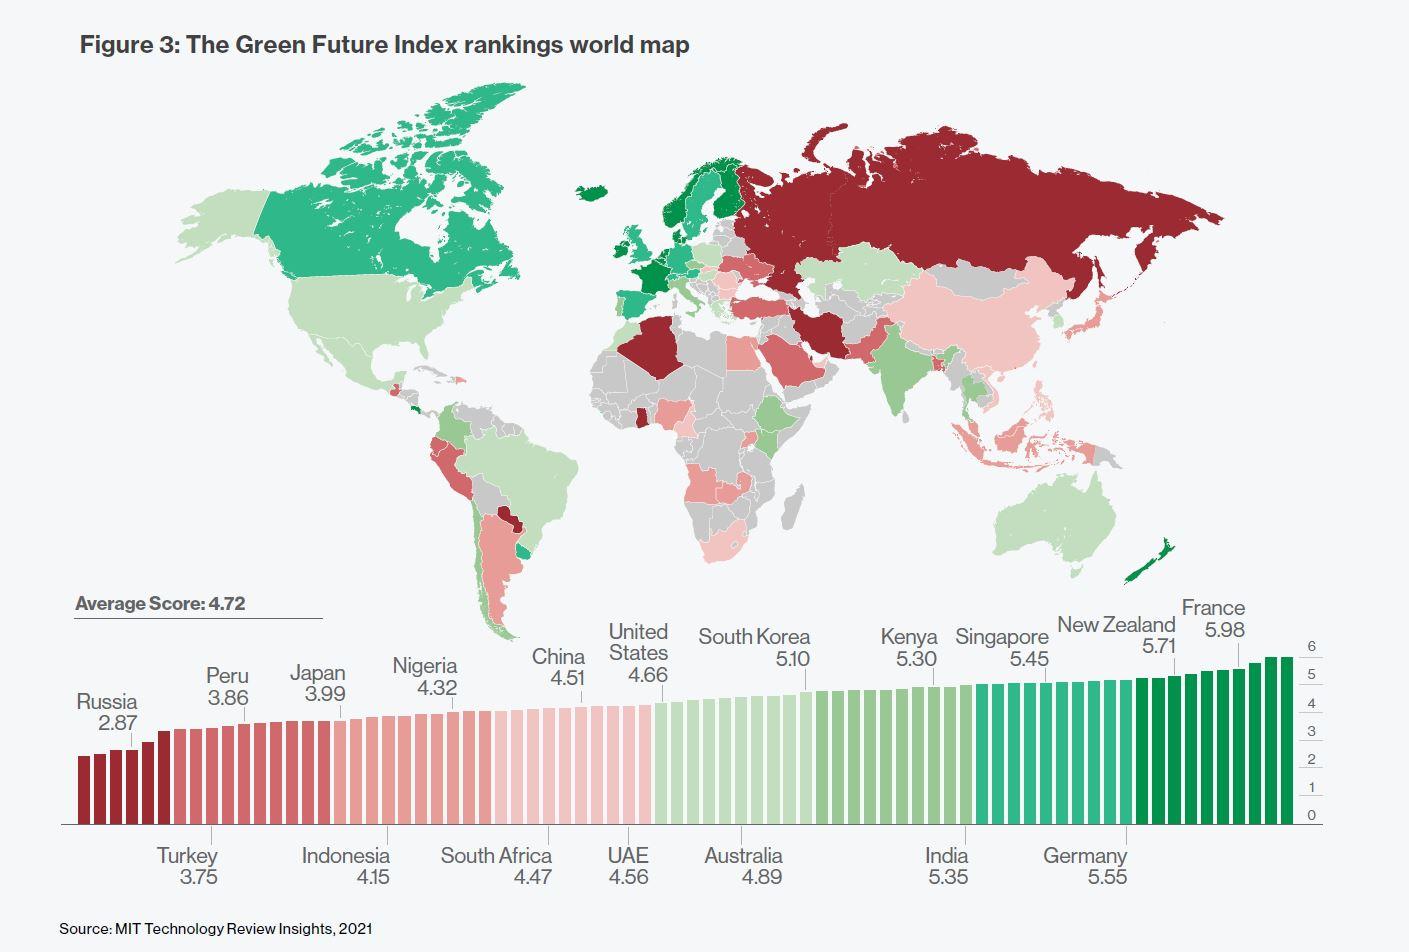 Future Green Index 2021 rankings